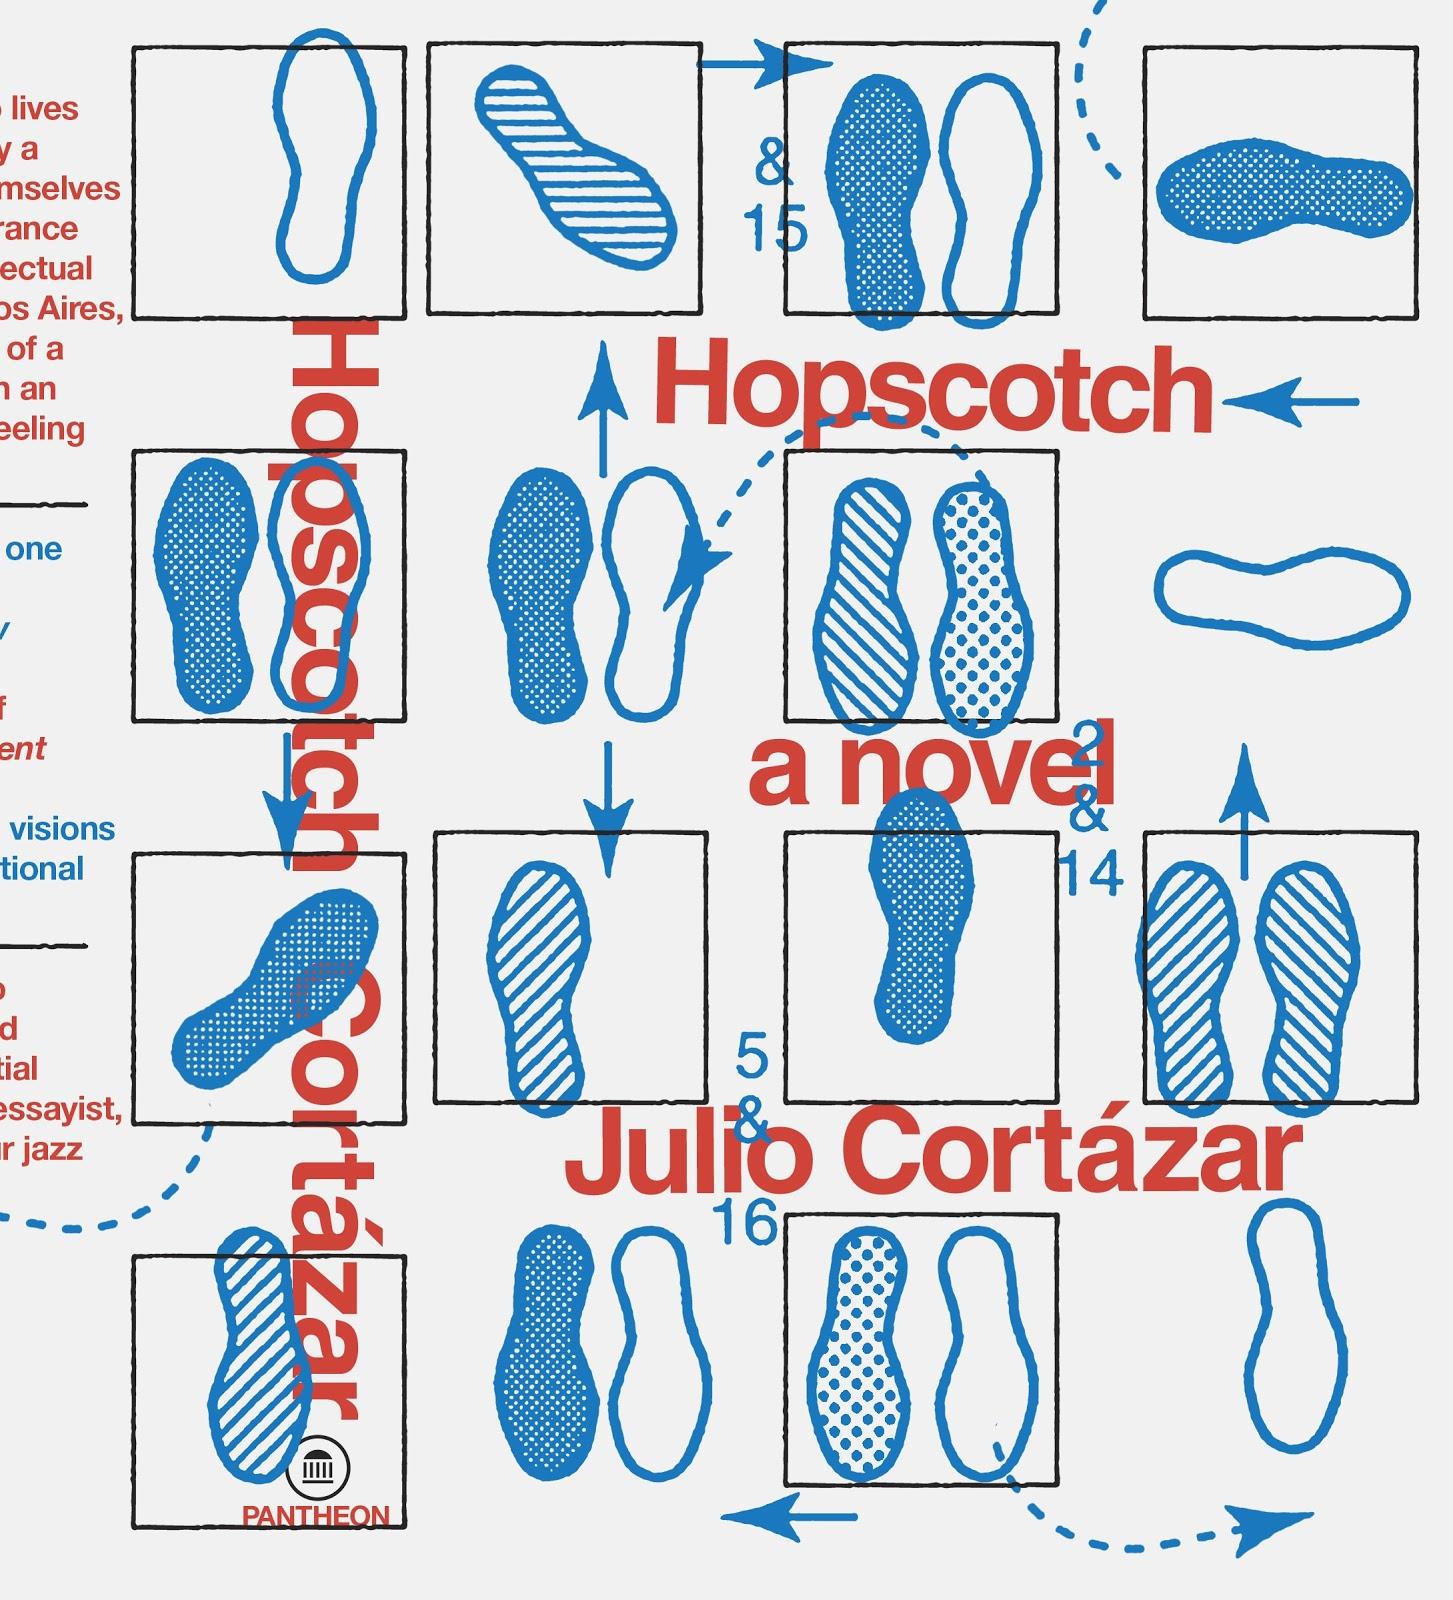 Jacket Mechanical Hopscotch